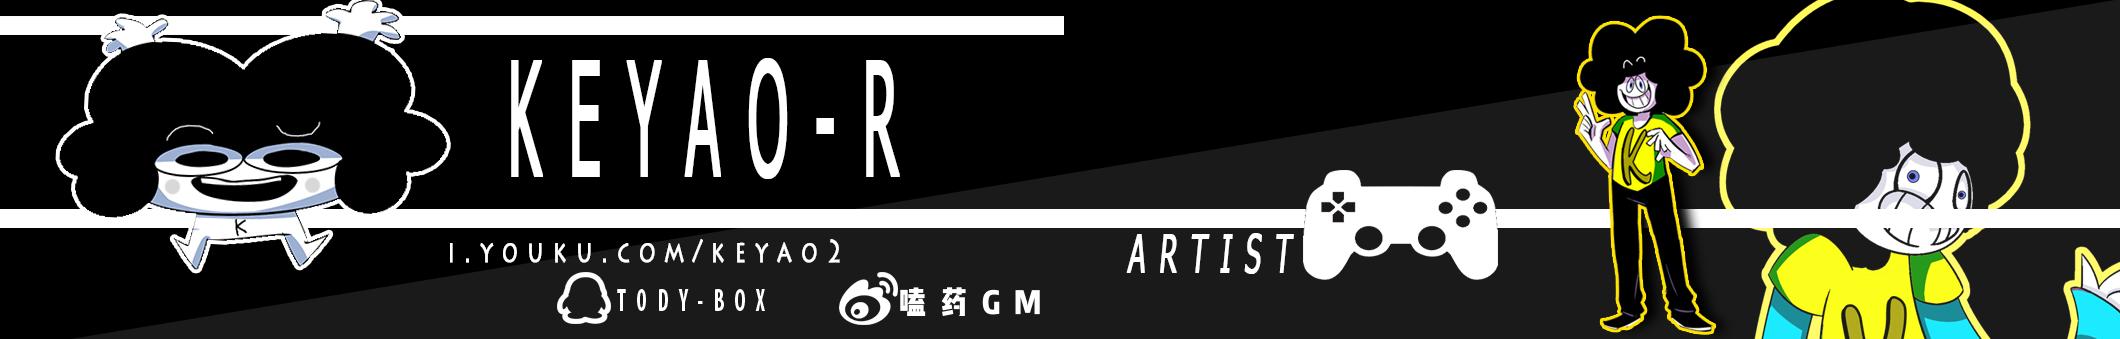 KEYAO-R banner